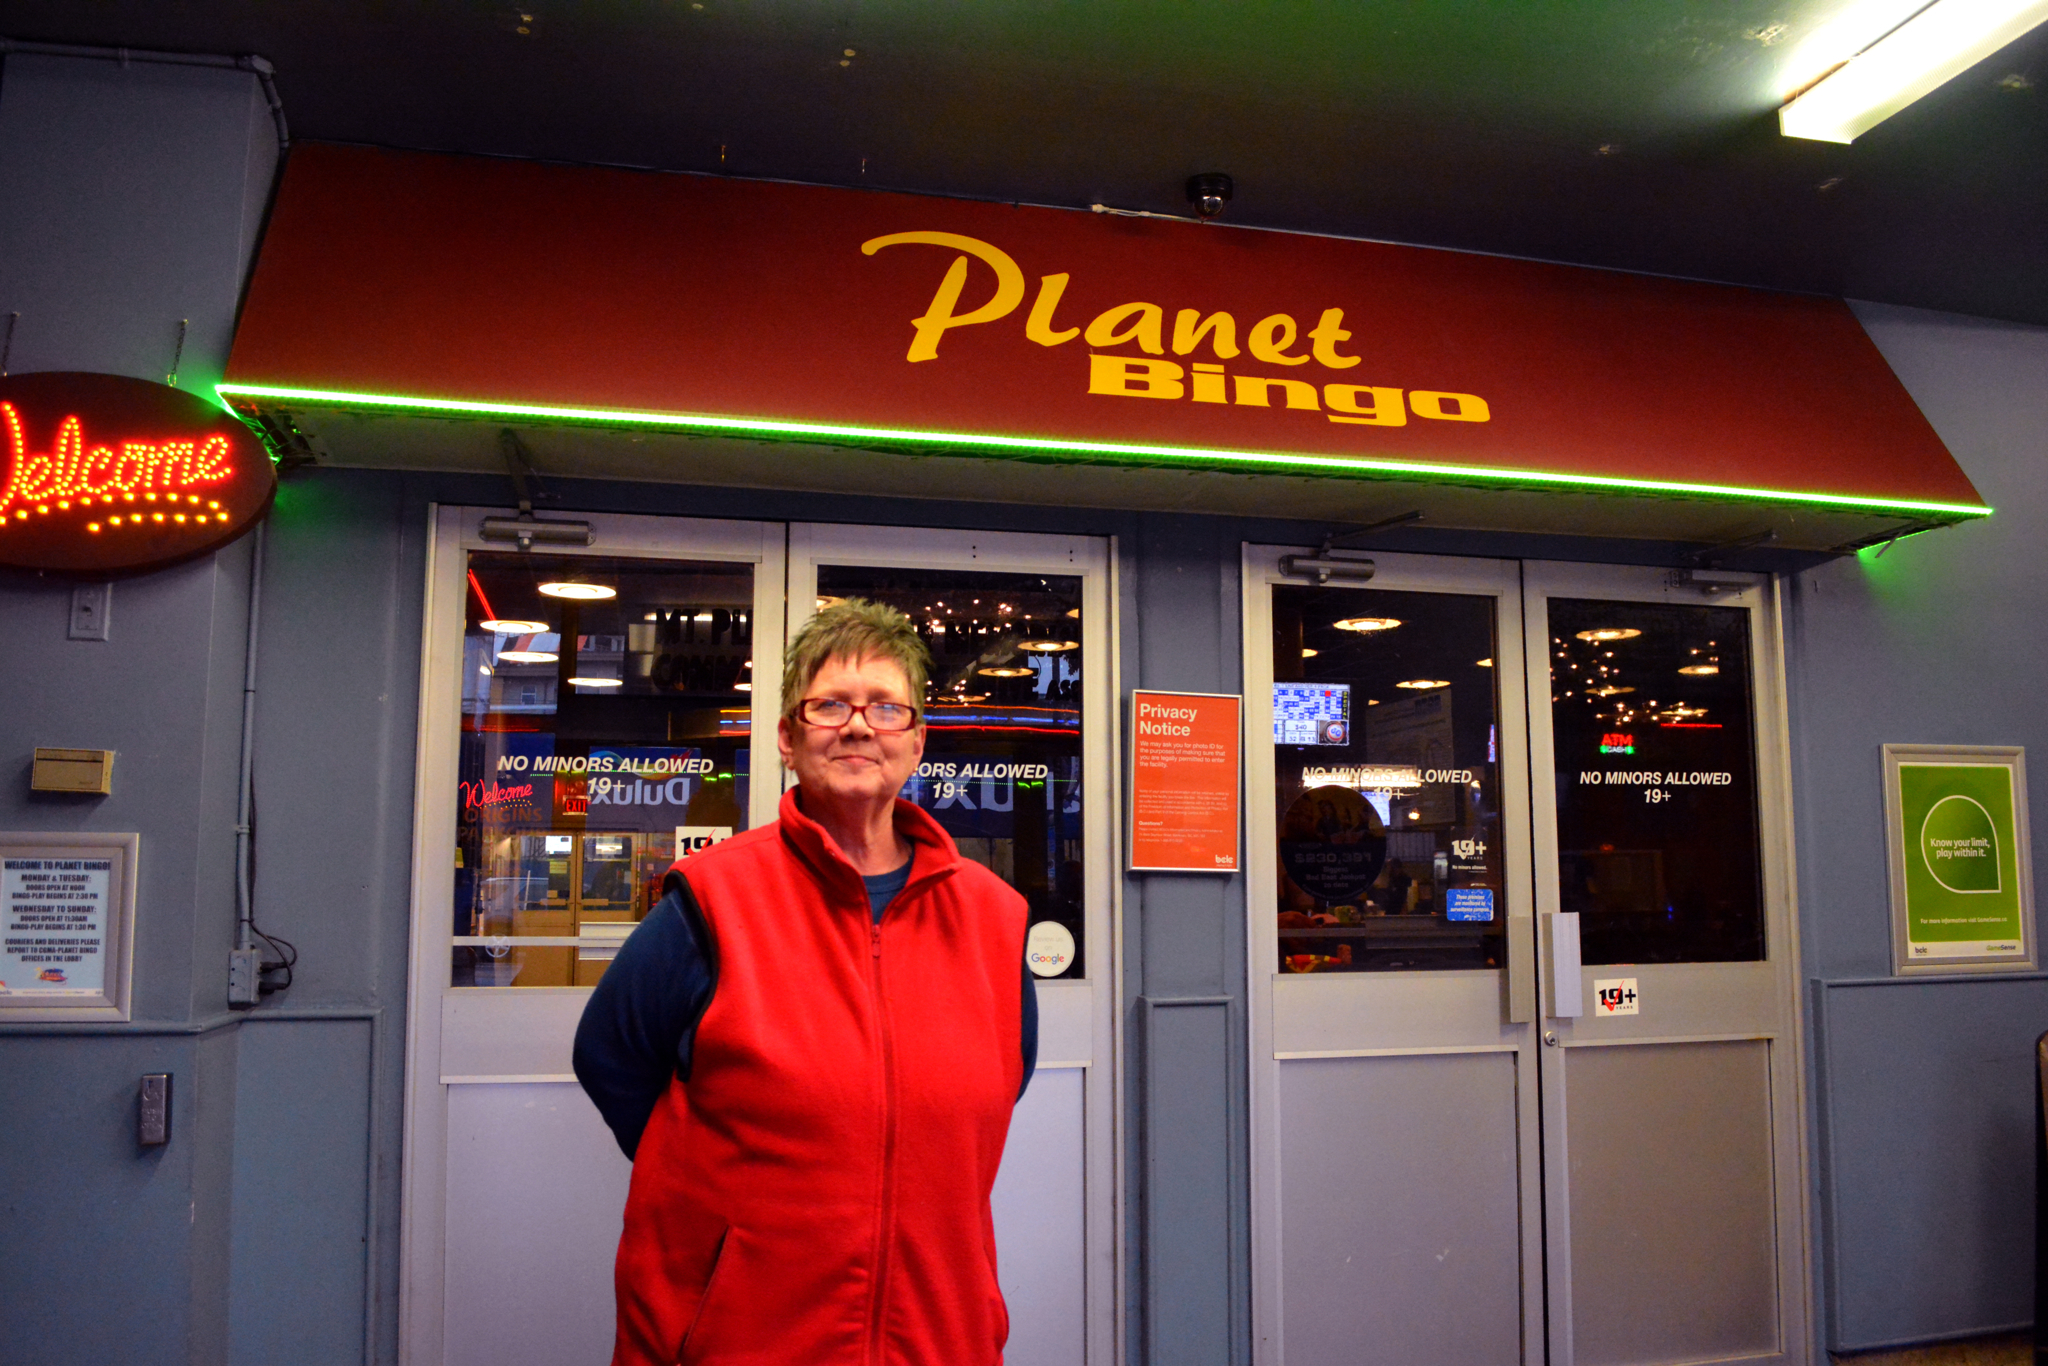 Planet Bingo in Vancouver